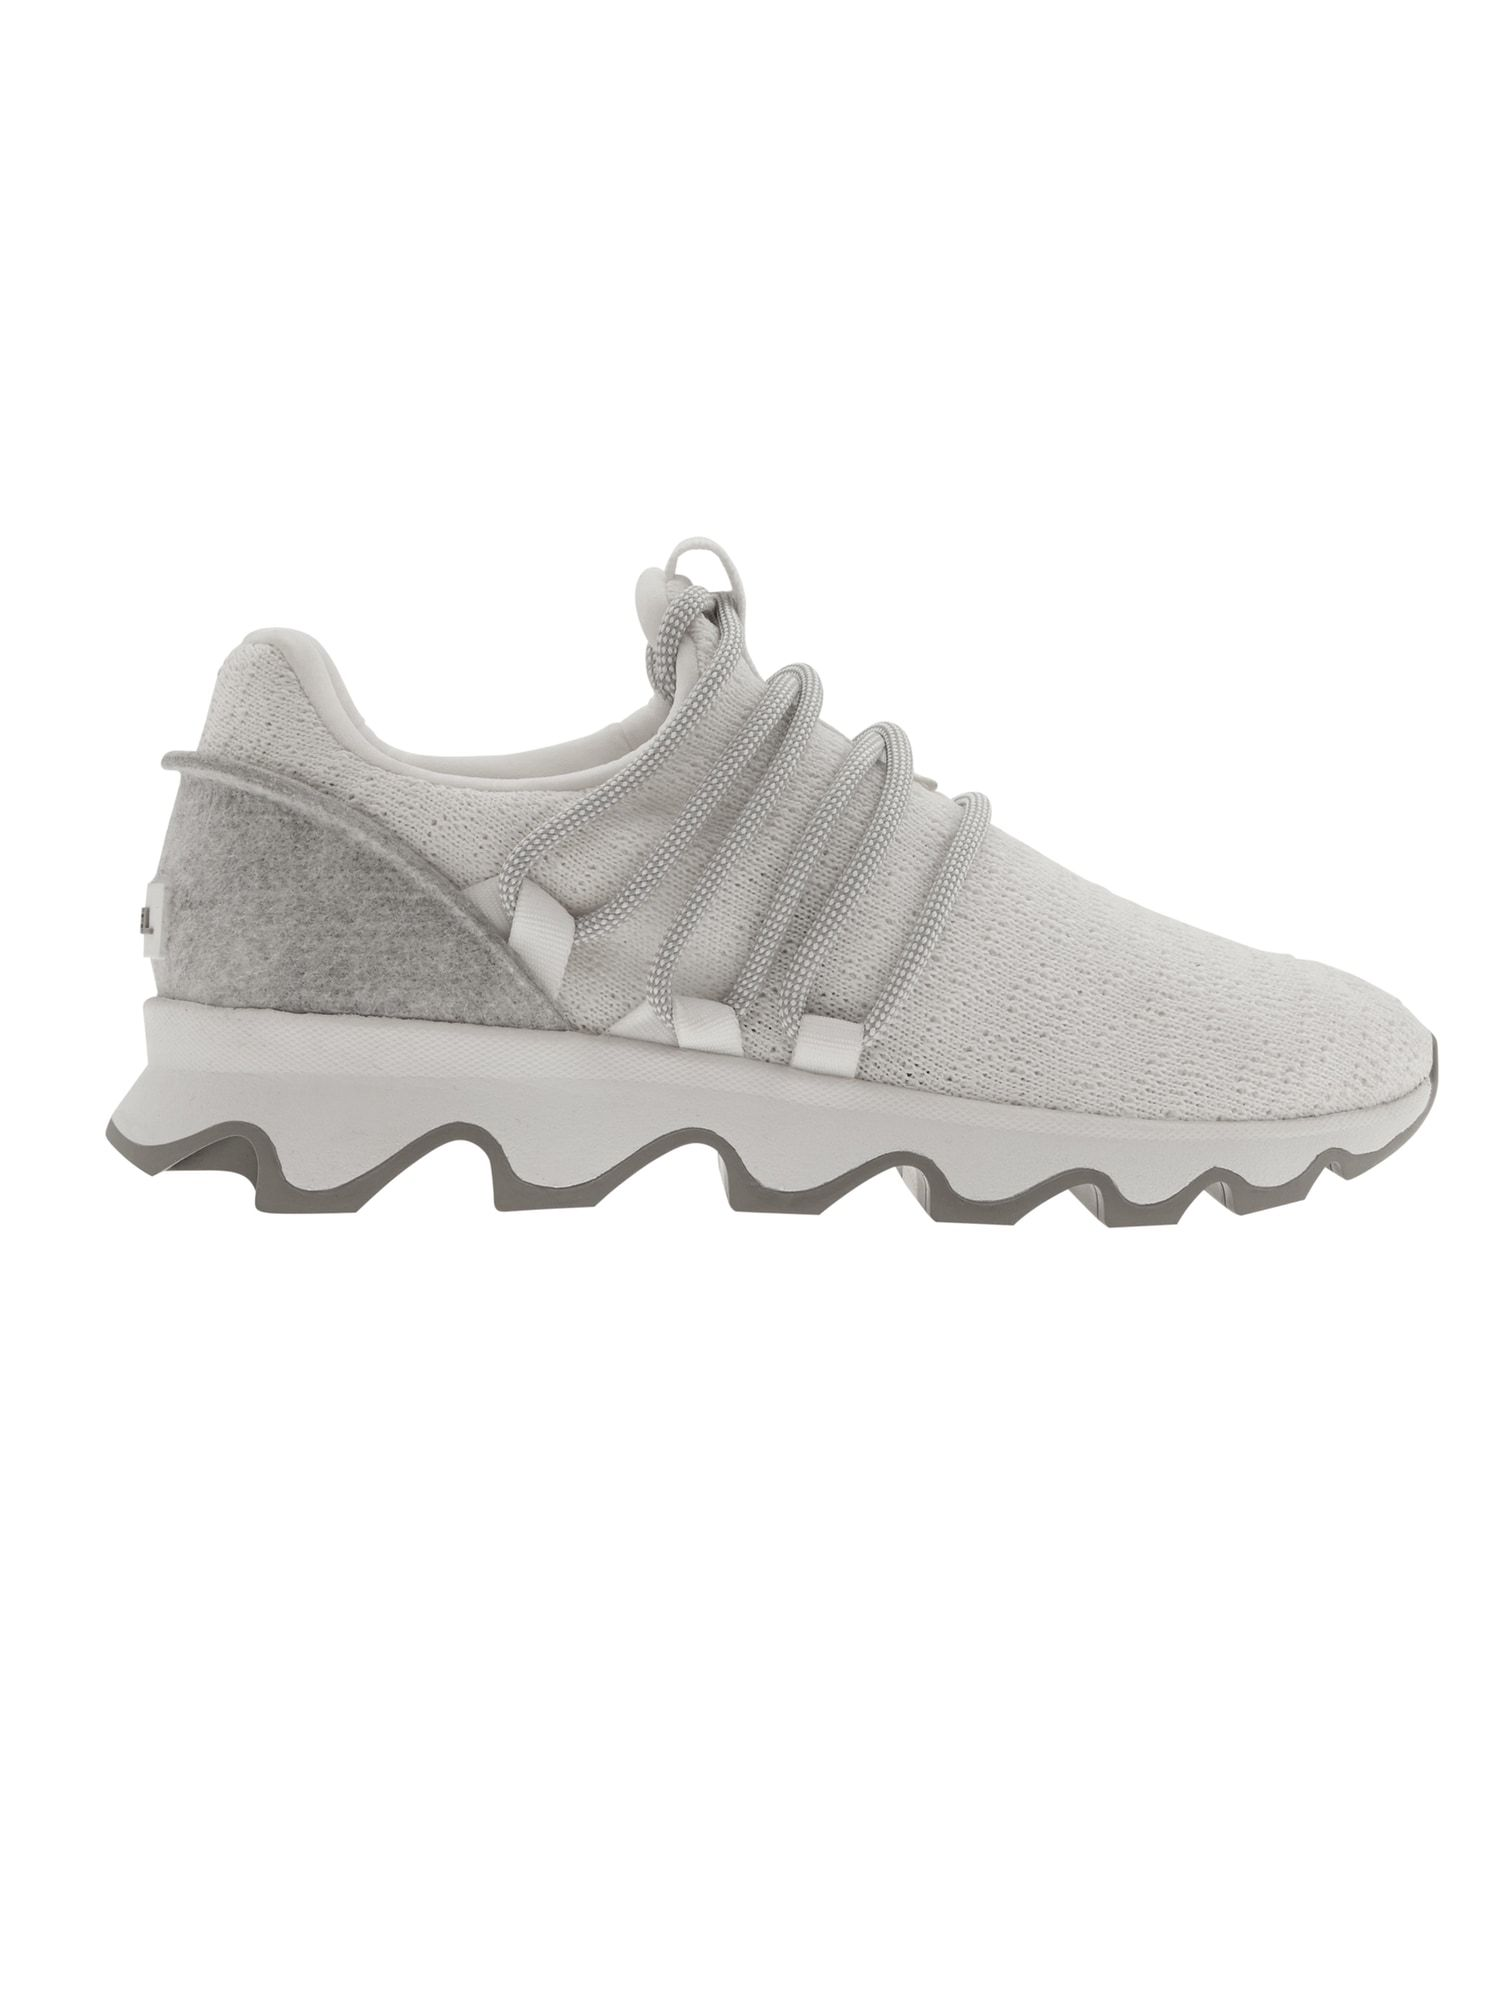 athleta sneakers